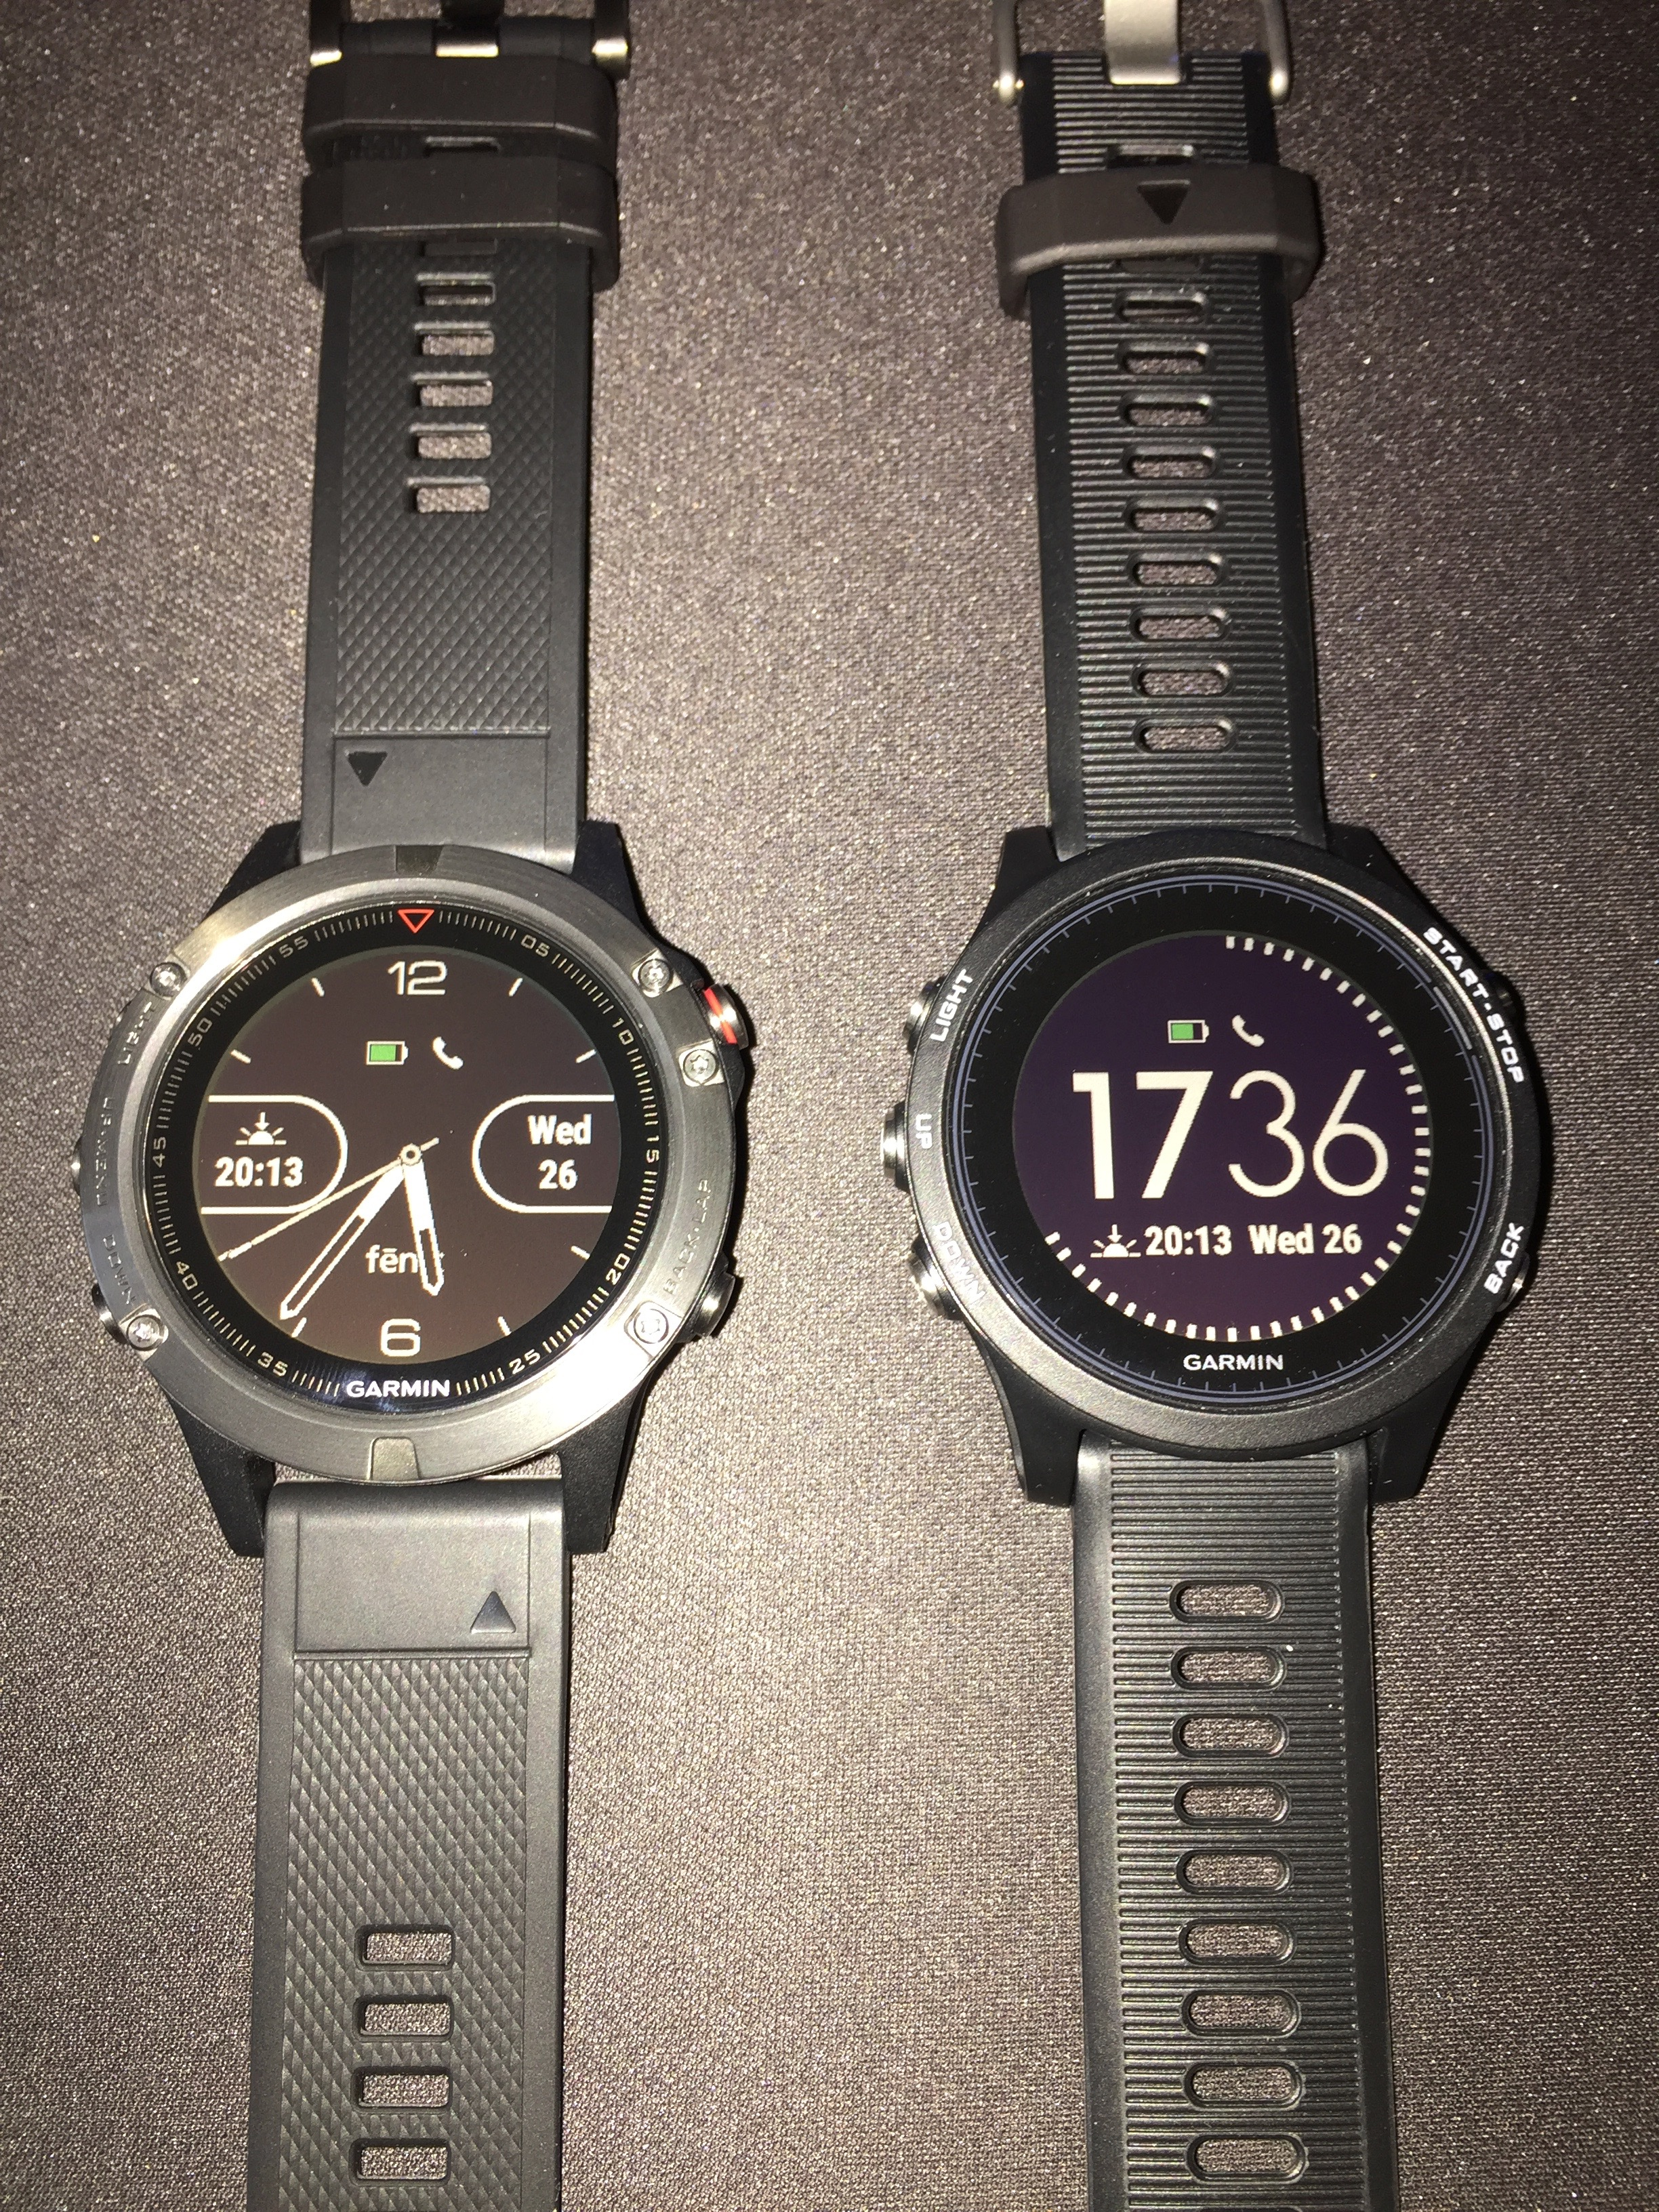 Garmin Fenix 5 Vs Forerunner 935 Which One To Buy Running